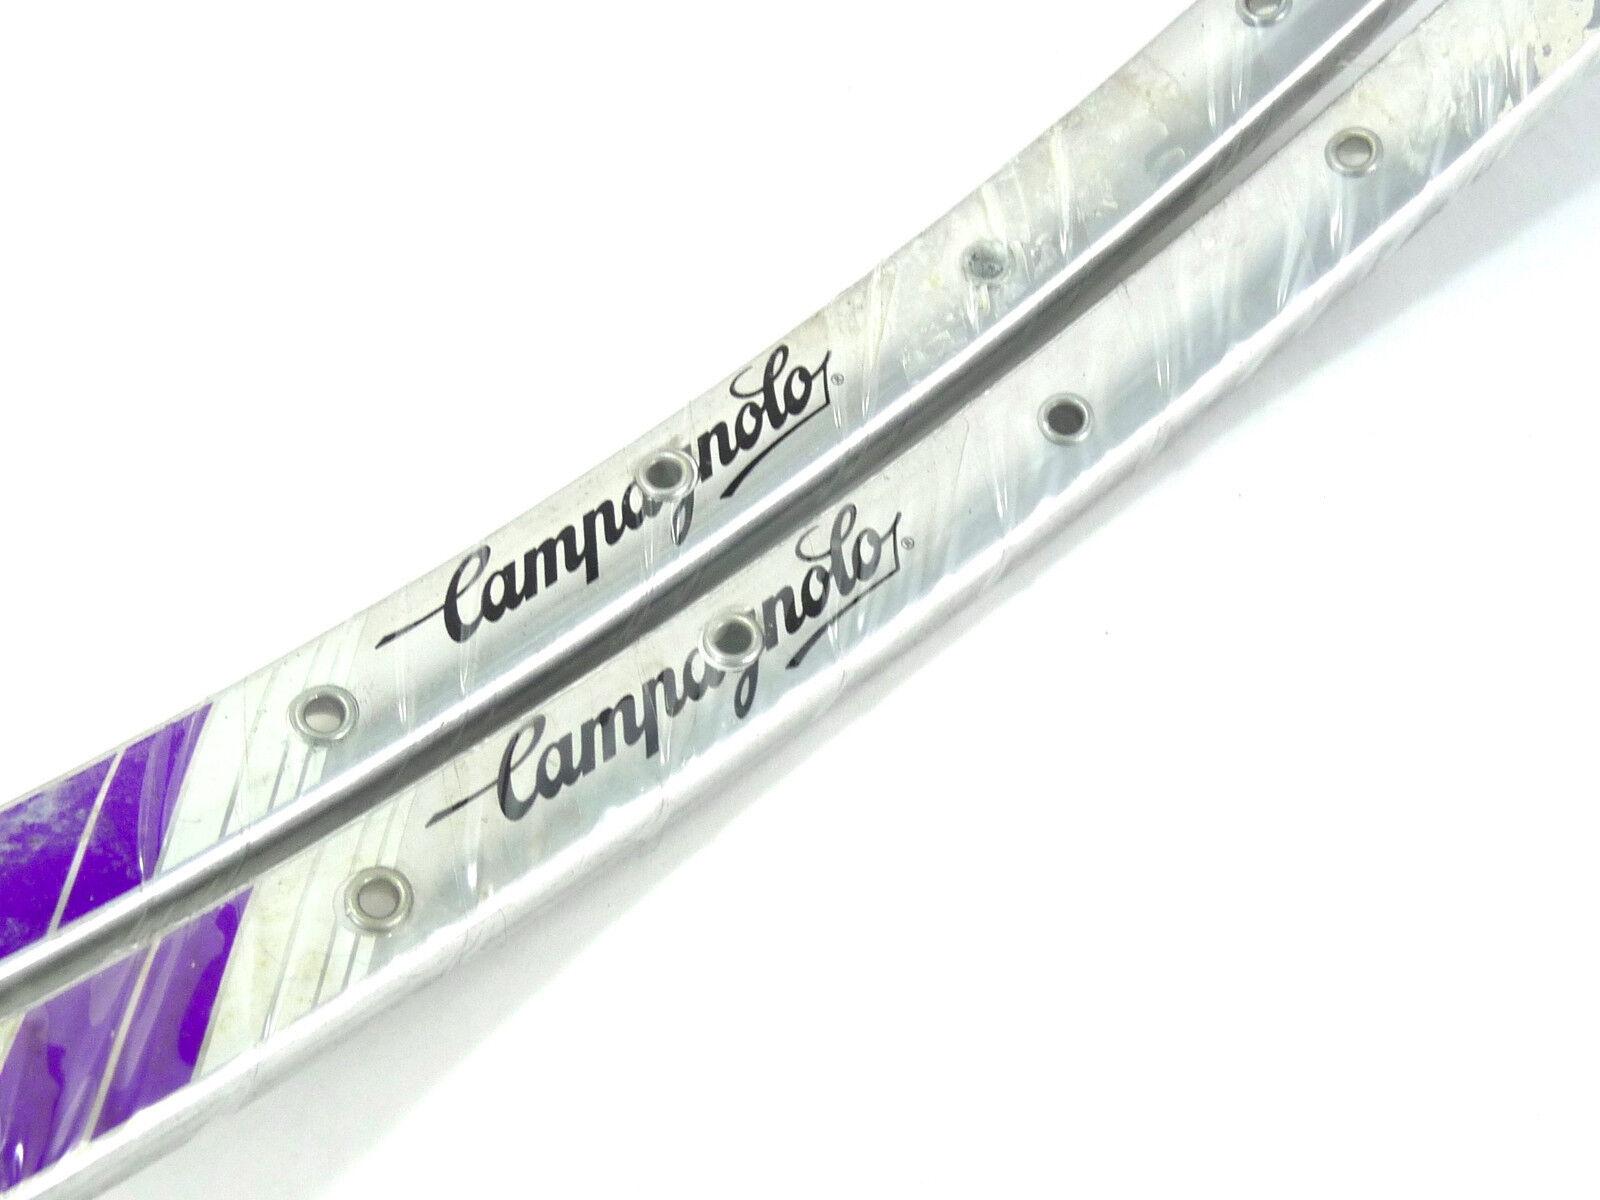 Campagnolo rim set 700c  Lambda Strada tubular 36h C Record Vintage LAST SET NOS  counter genuine